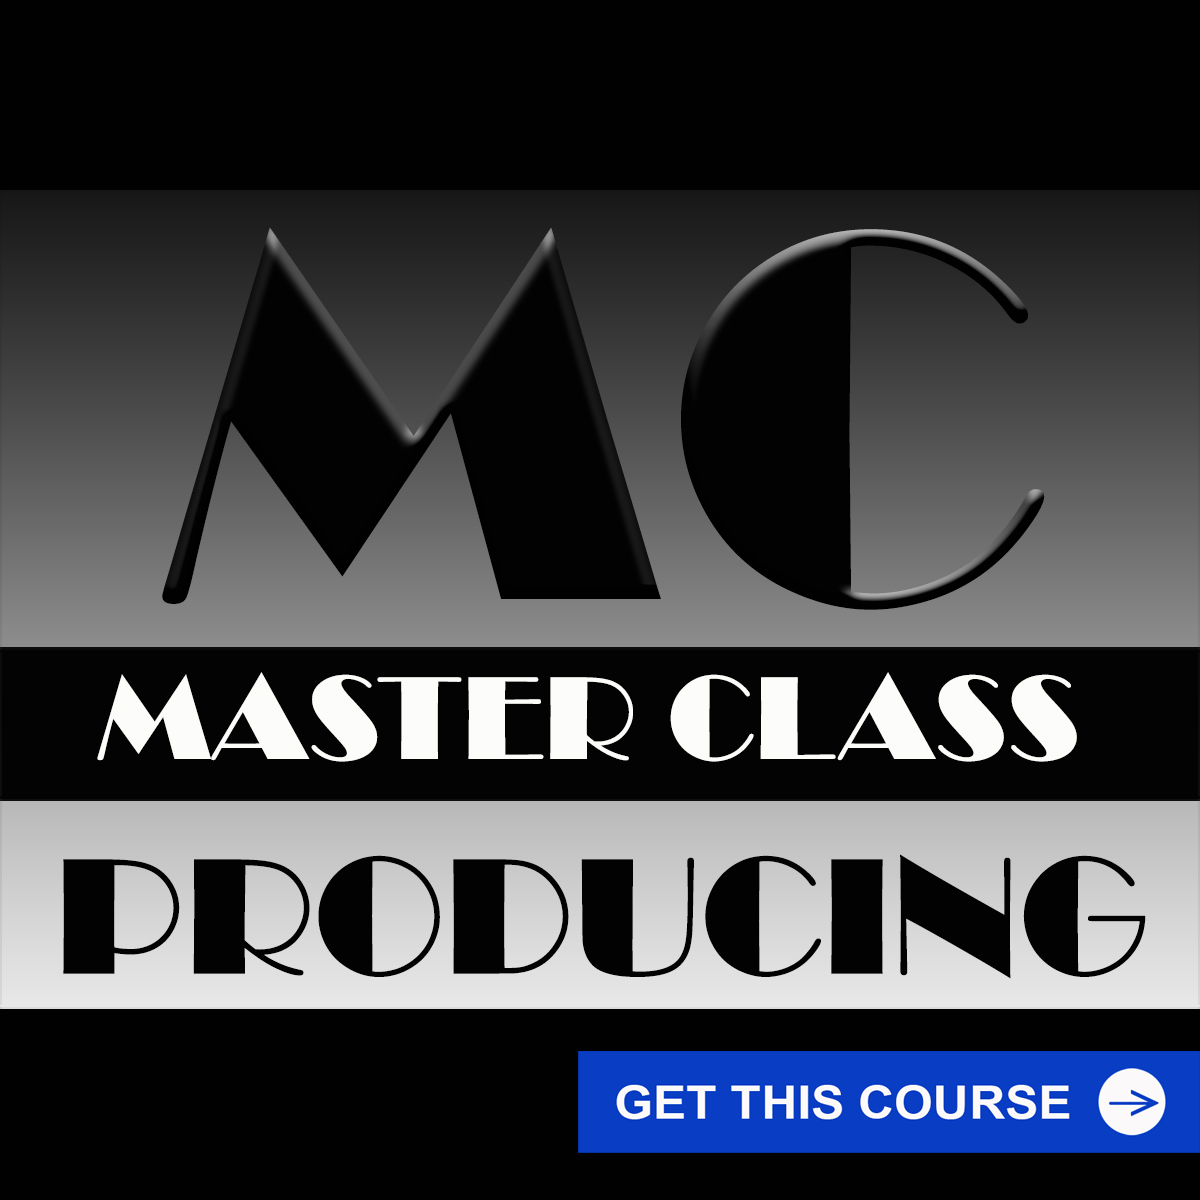 MASTER CLASS - PRODUCING COURSE